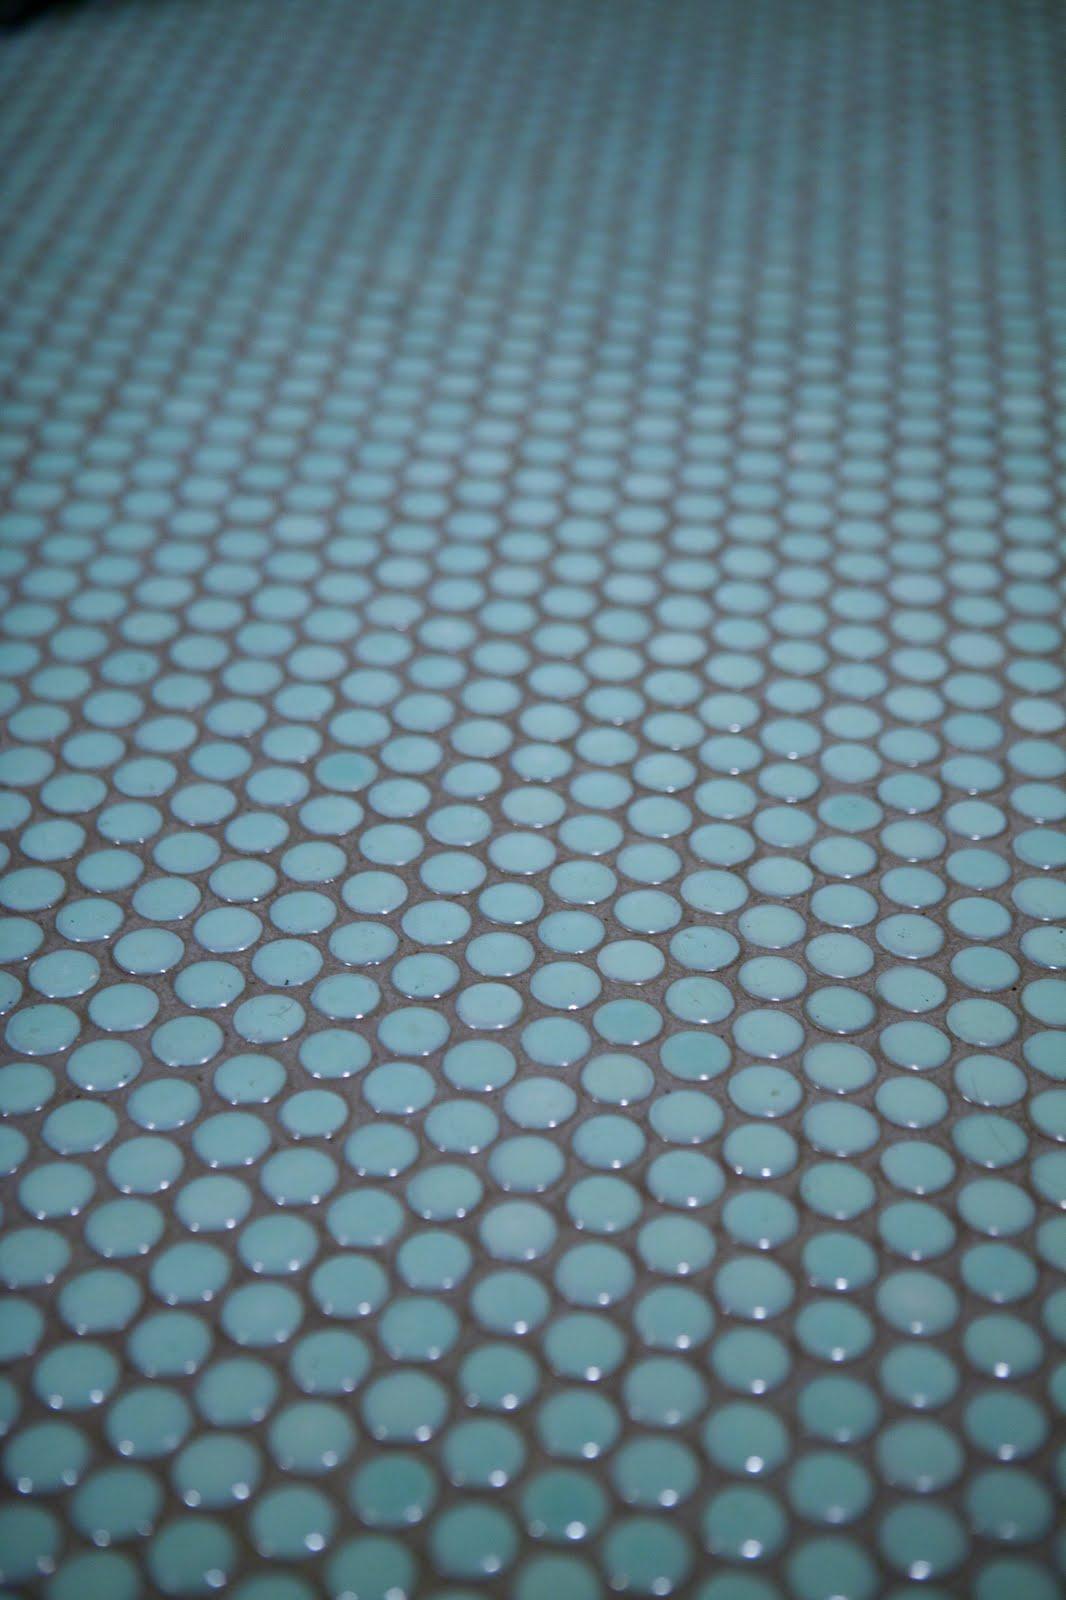 1000 ideas about blue penny tile on pinterest penny for Blue floor tile